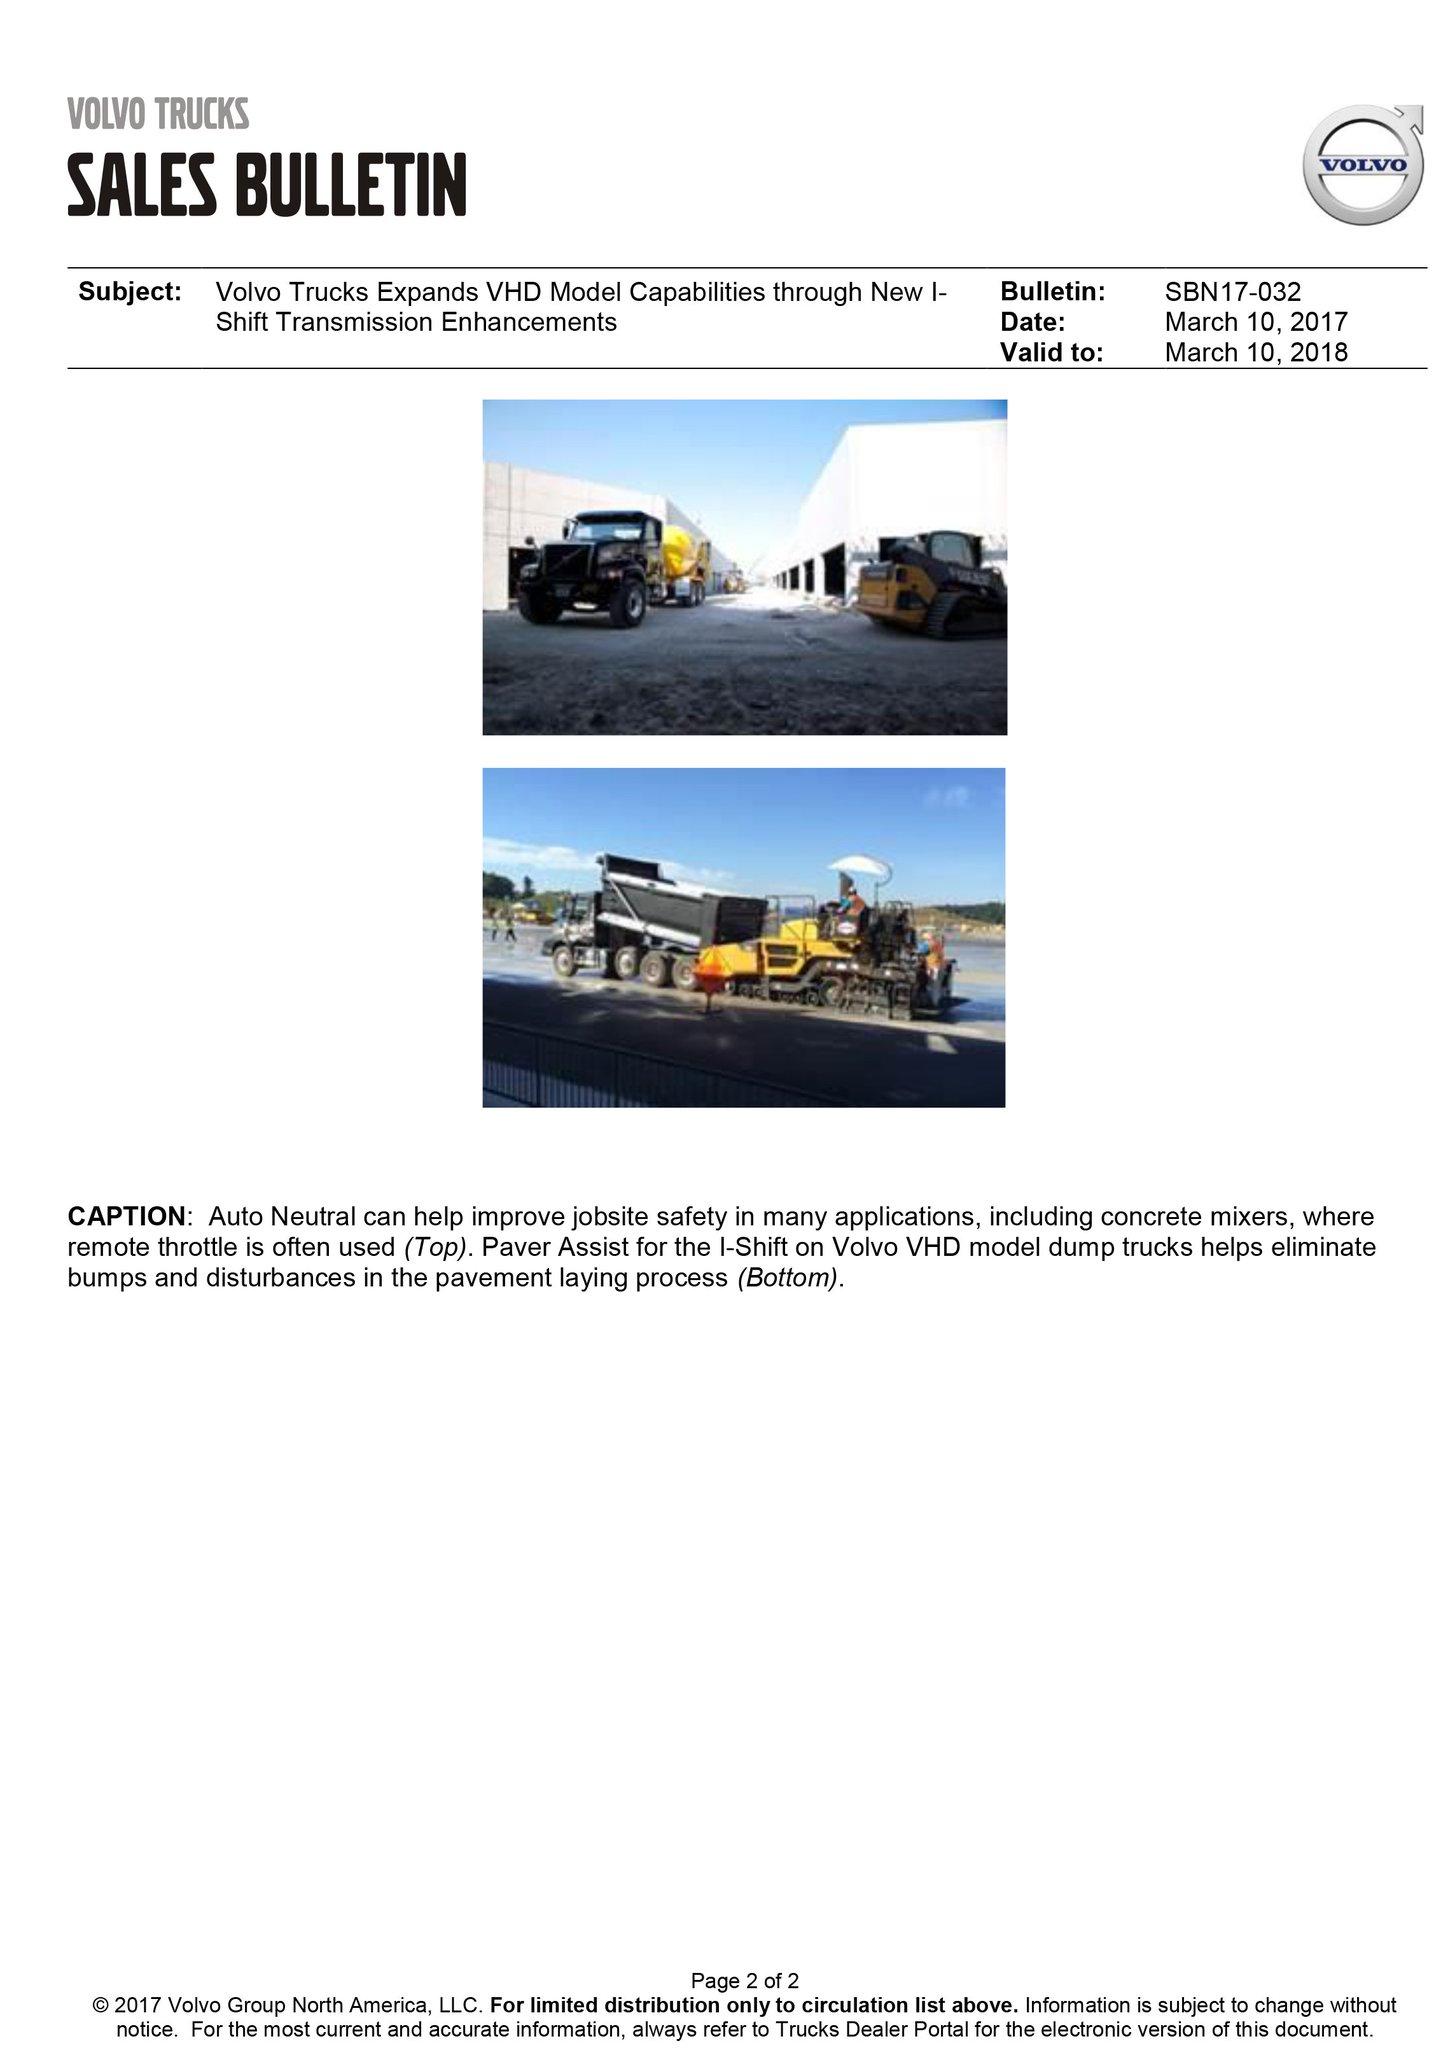 "Vision Truck Group on Twitter ""Volvo Trucks Expands VHD Model"